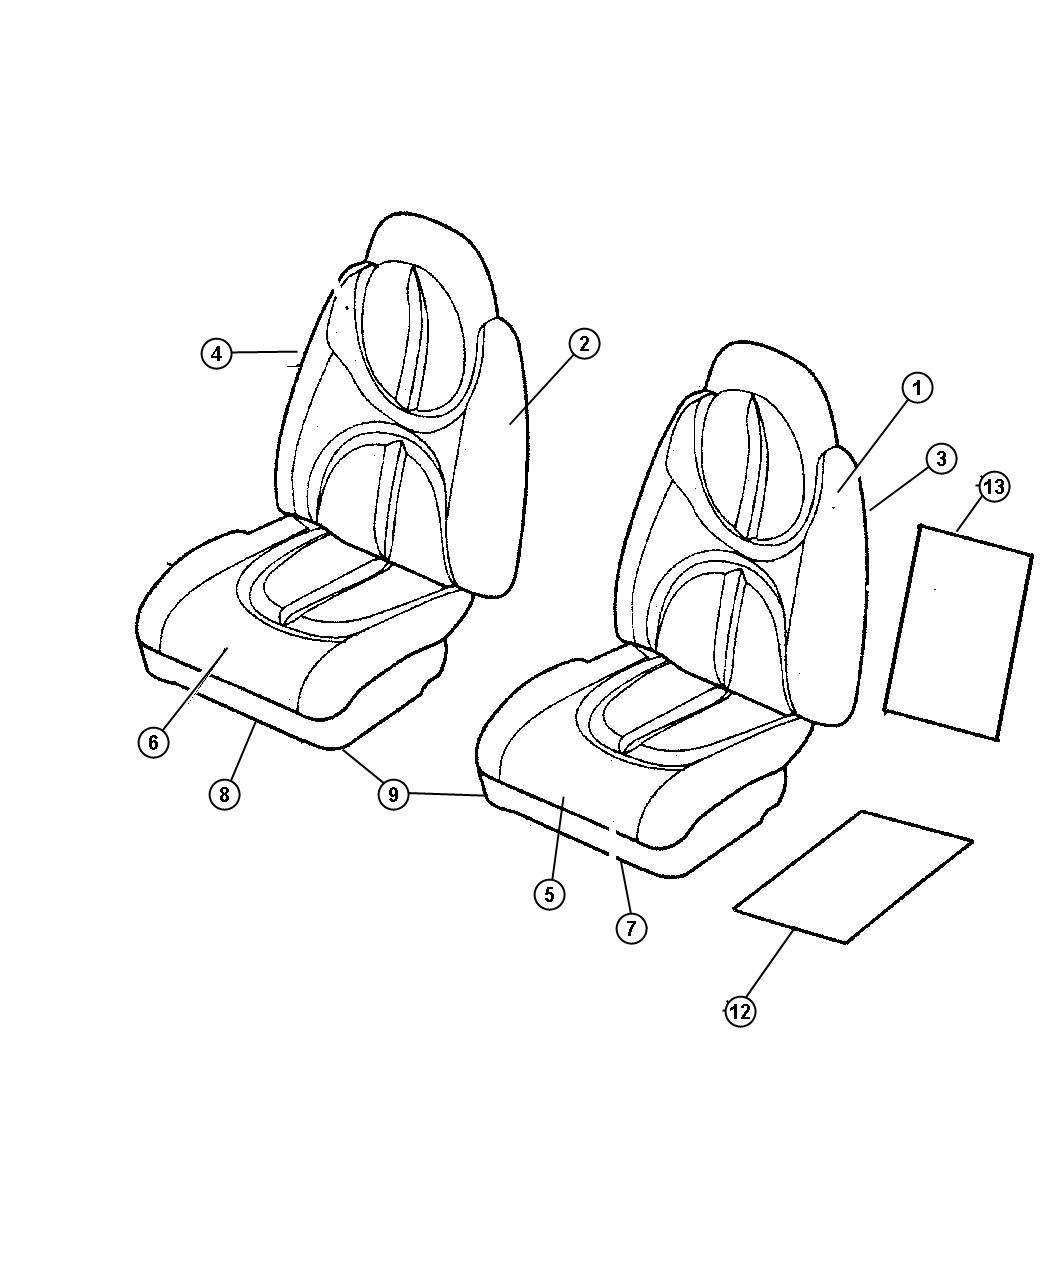 Dodge Durango Cover. Front seat cushion. [t5]. Trim